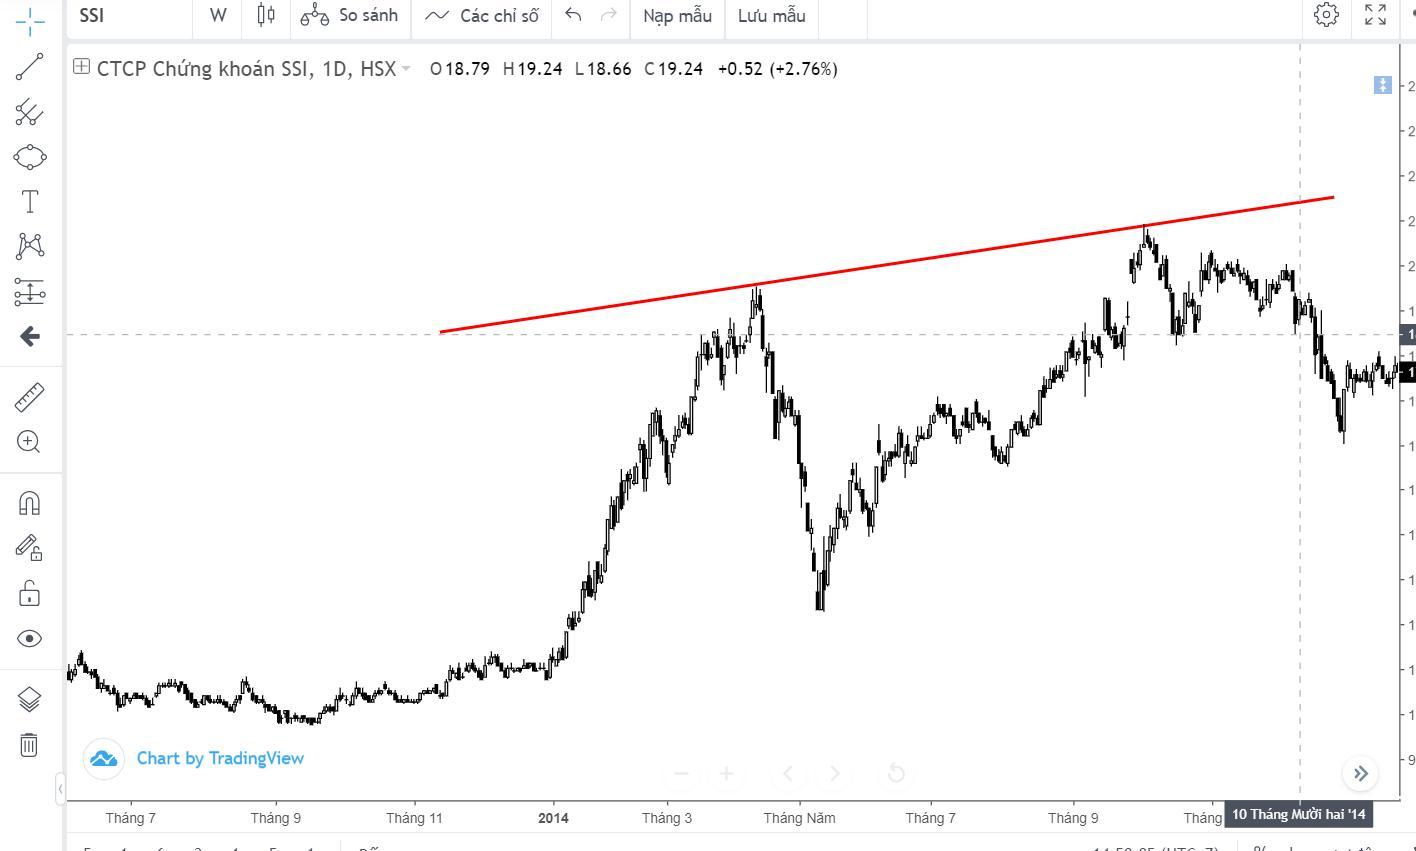 lop-hoc-andrews-pitchfork-can-ban-bai-5-cach-su-dung-chuyen-sau-duong-median-line (3).jpg